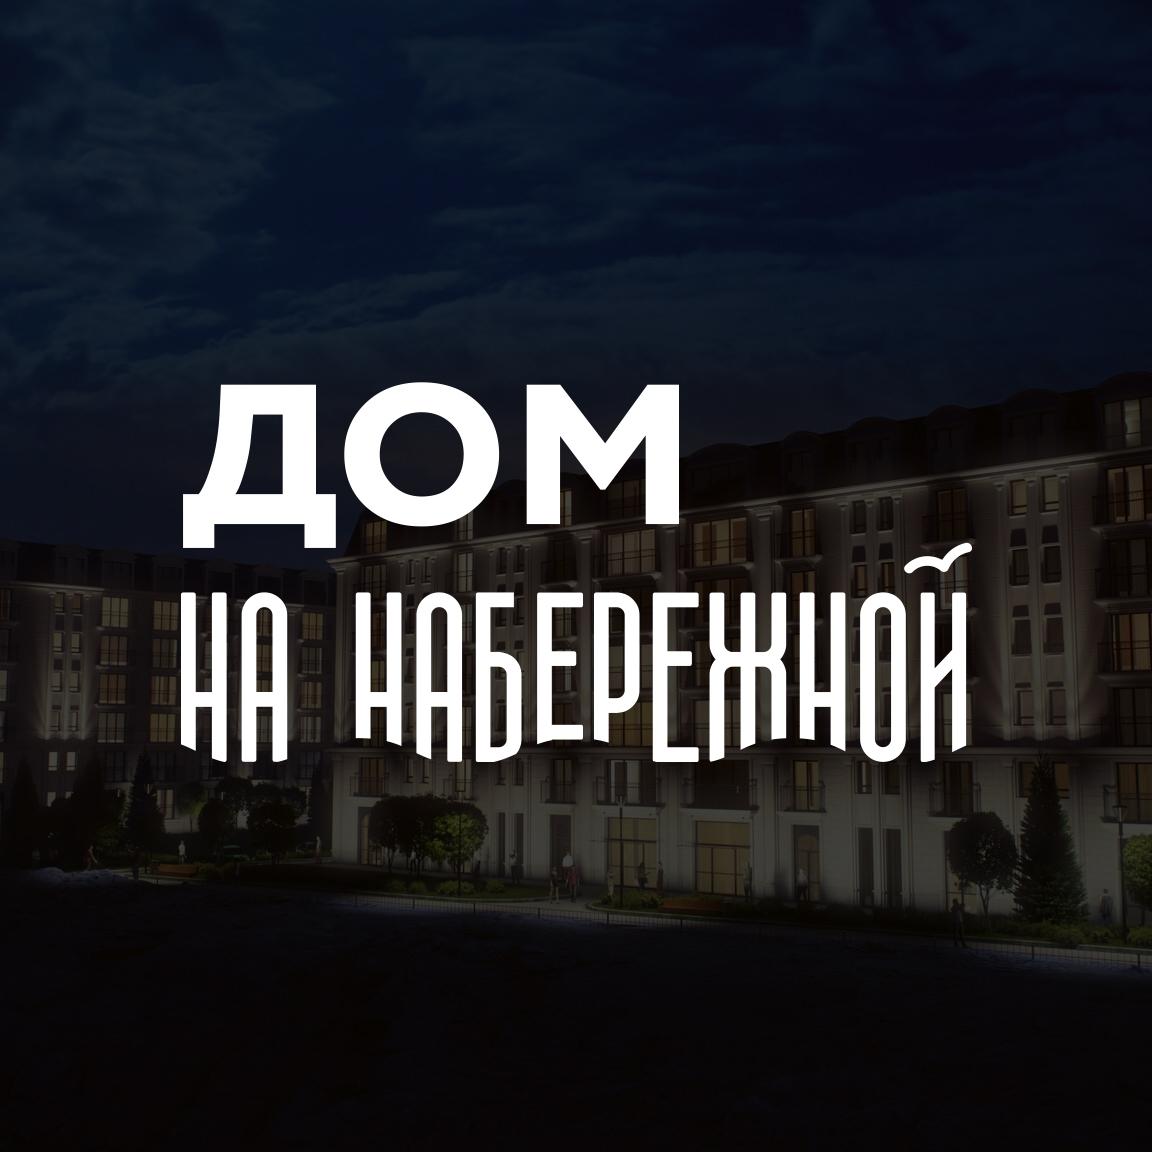 РАЗРАБОТКА логотипа для ЖИЛОГО КОМПЛЕКСА премиум В АНАПЕ.  фото f_1545de7f1e3c81f0.jpg